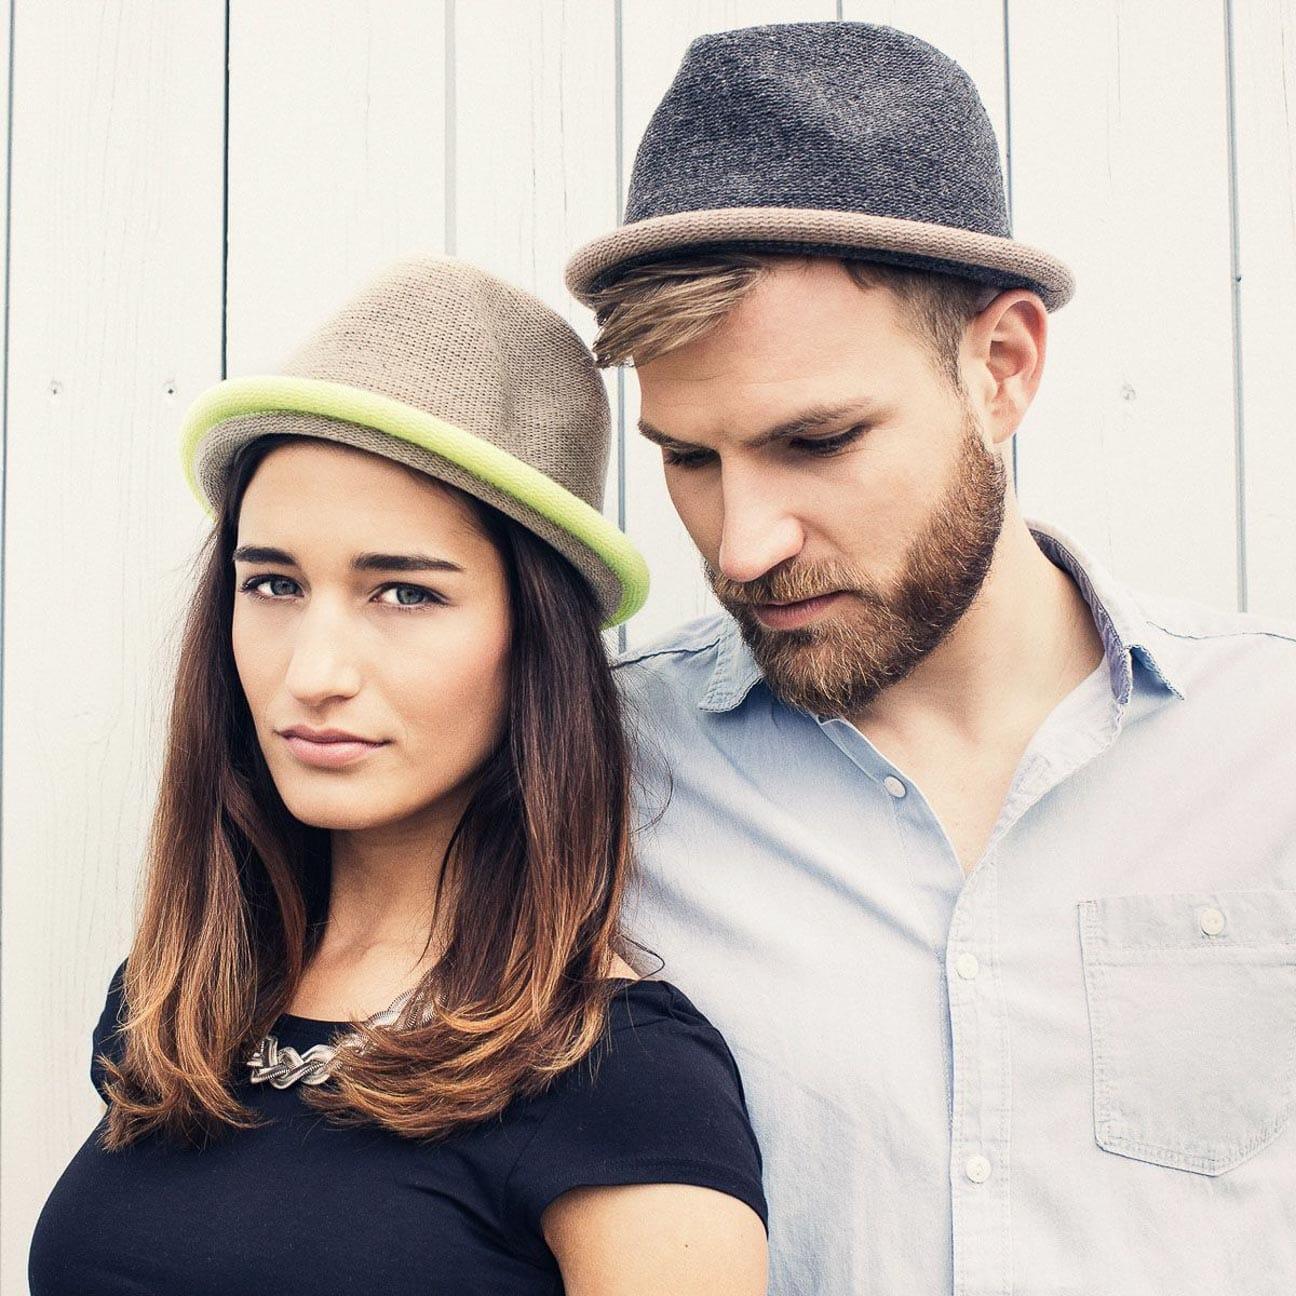 hoeden dating service